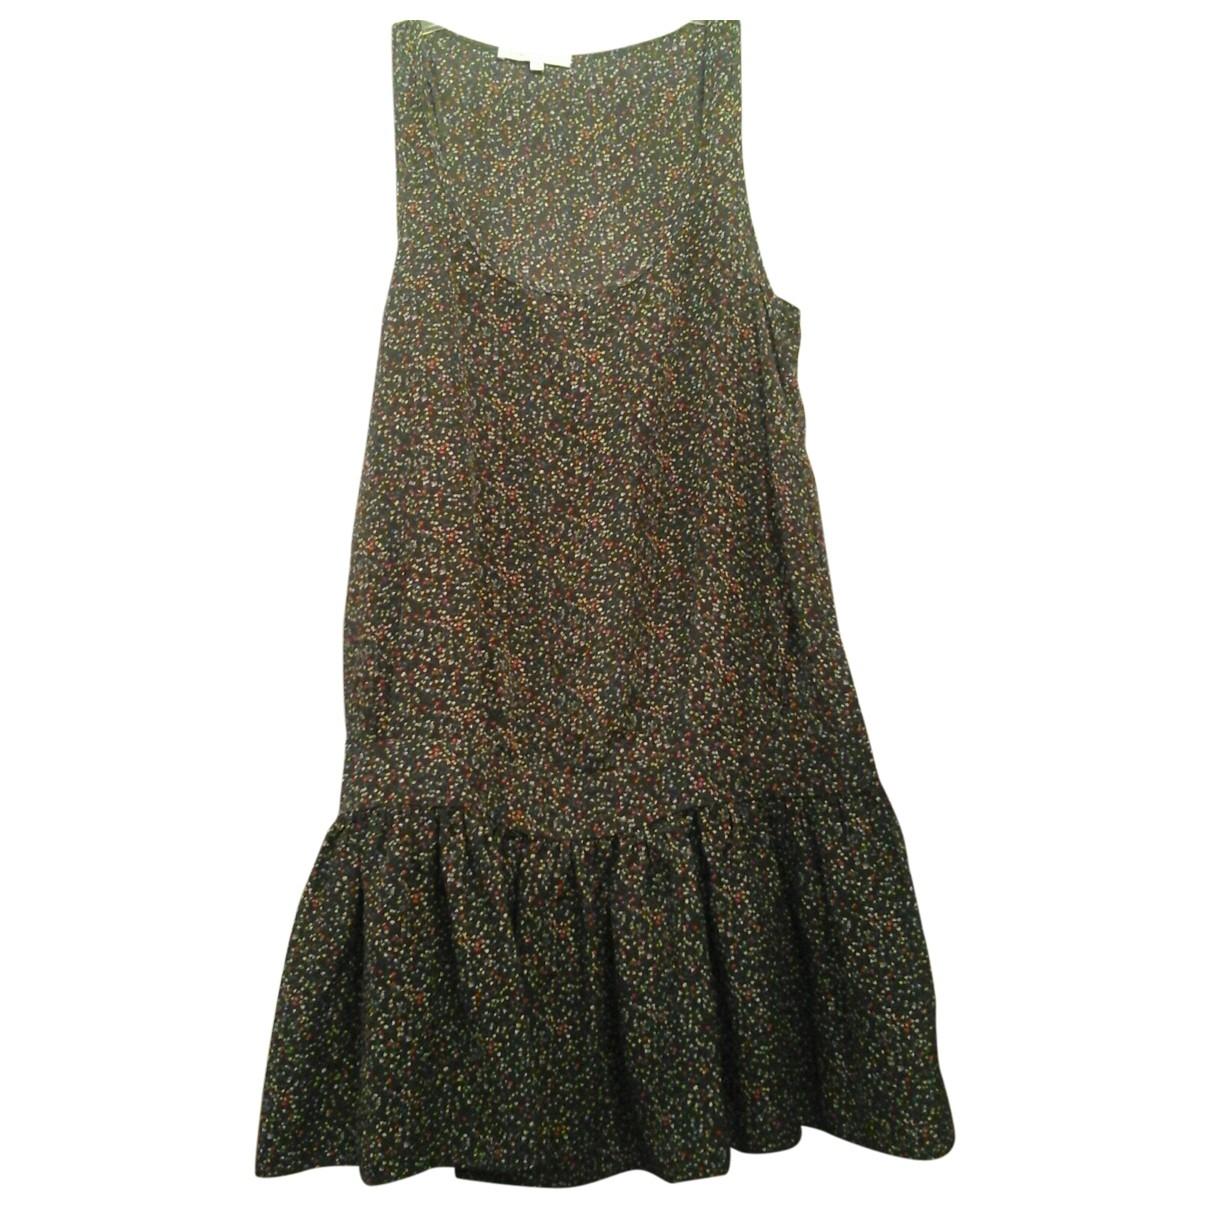 Maje \N Silk dress for Women S International